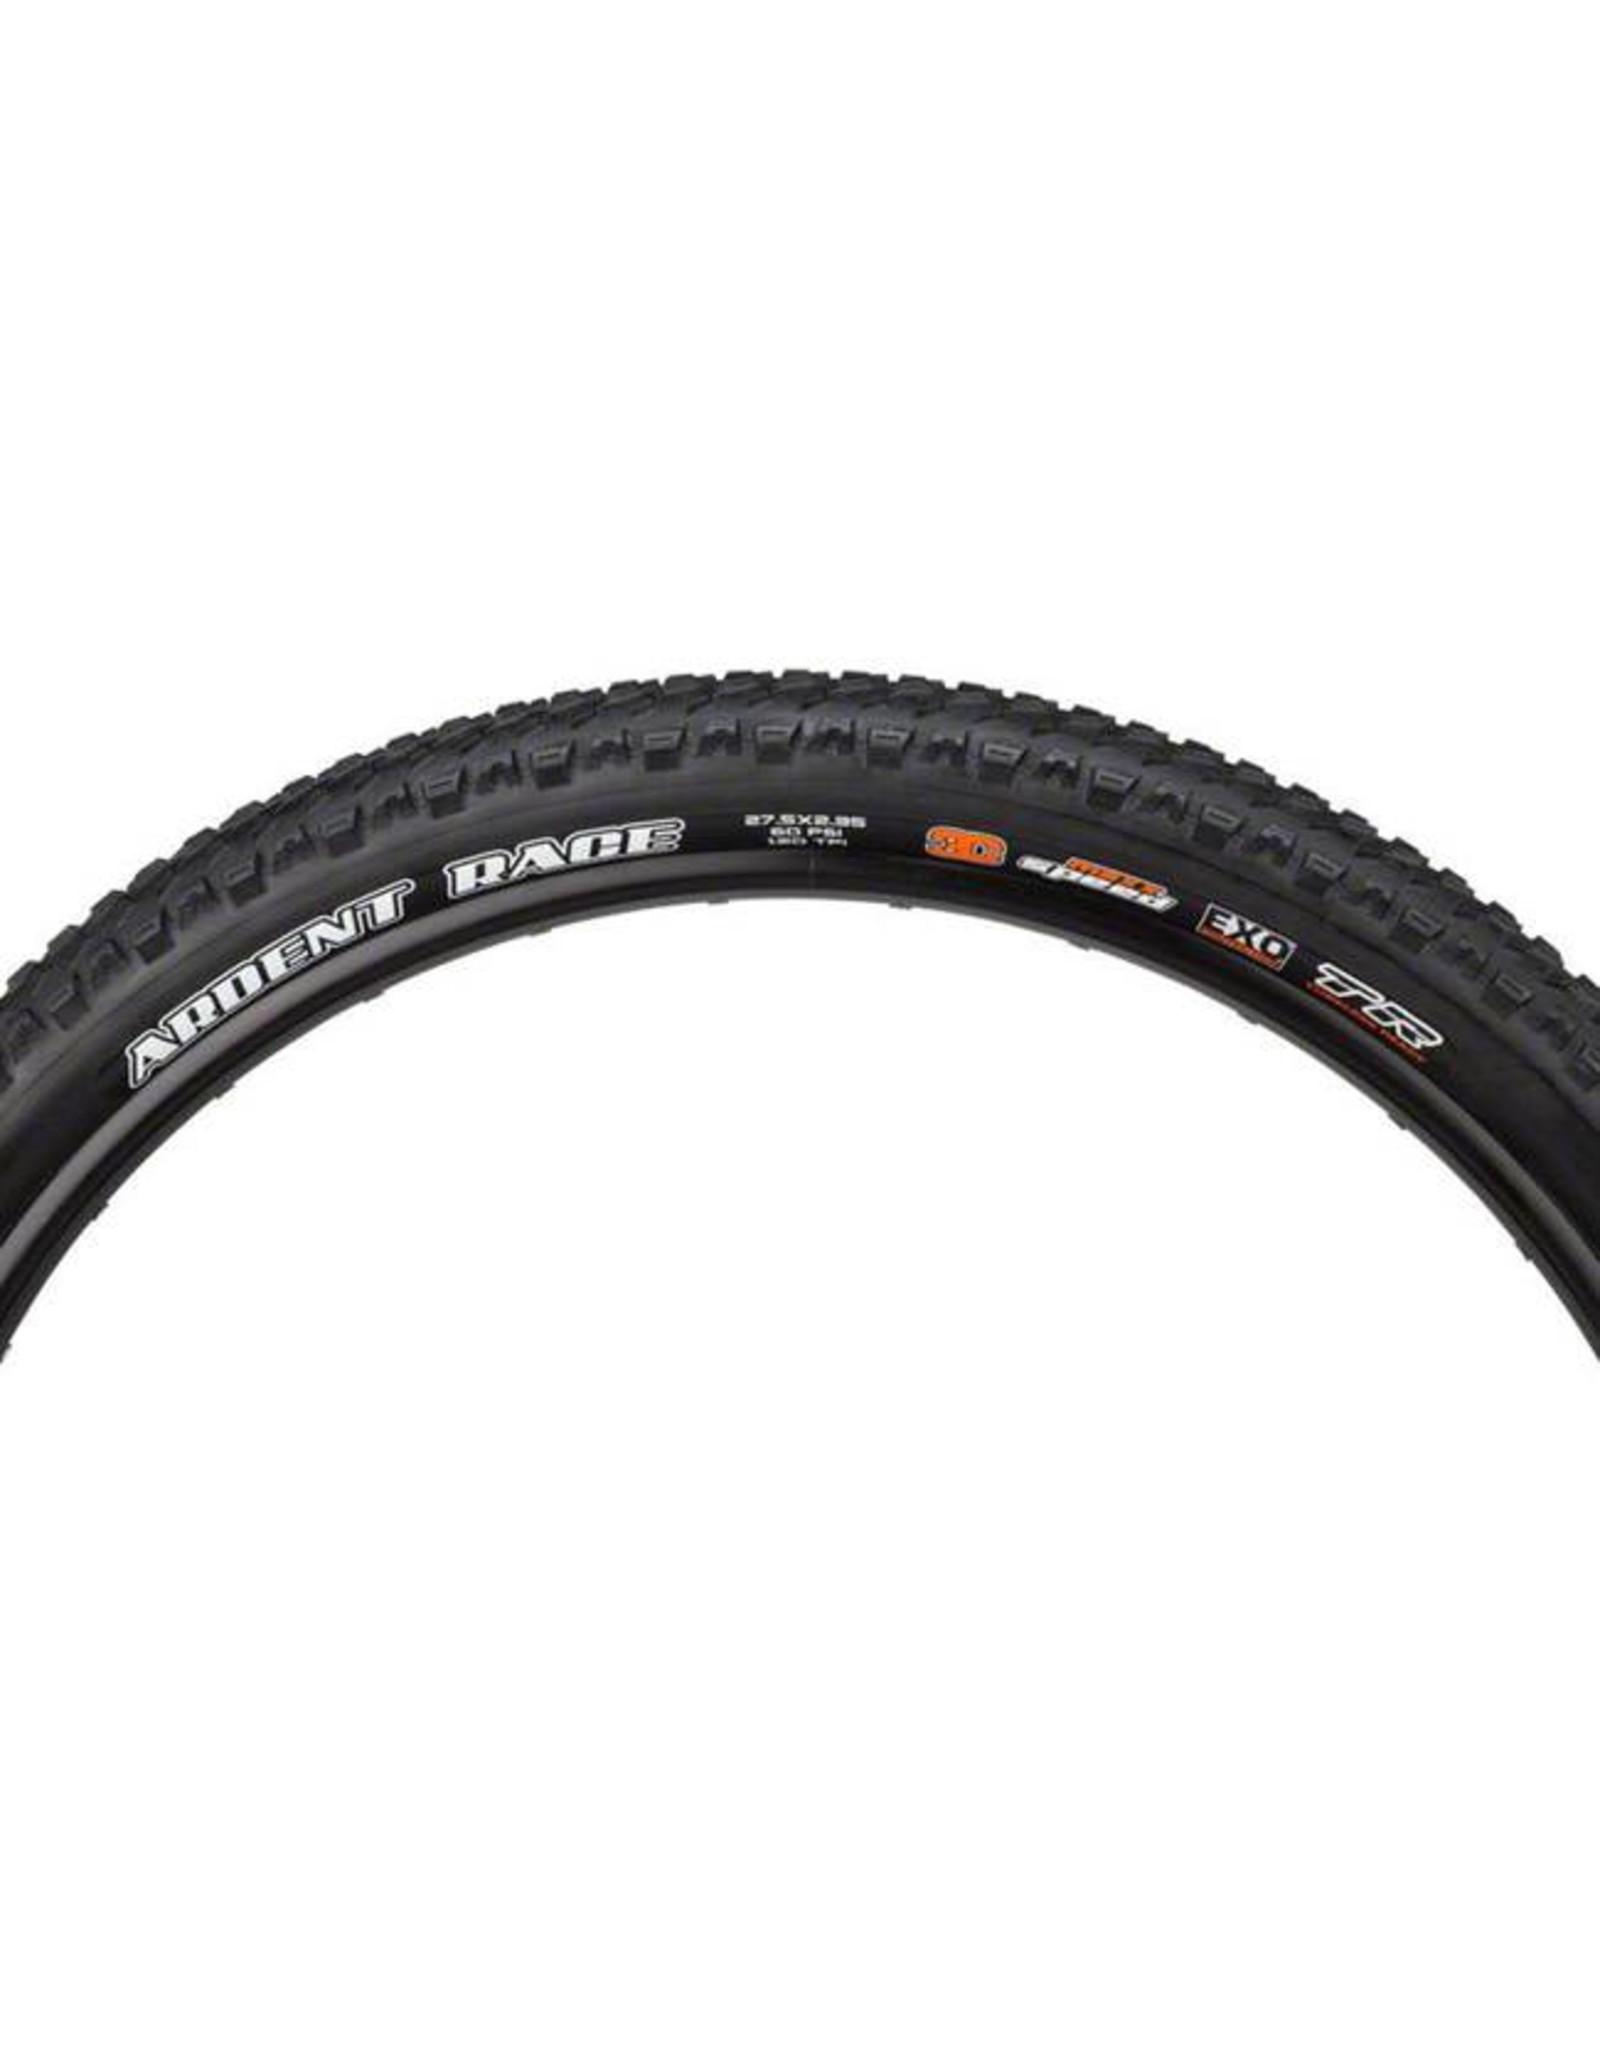 "Maxxis Maxxis Ardent Race Tire: 27.5 x 2.35"", Folding, 120tpi, 3C, EXO, Tubeless Ready, Black"